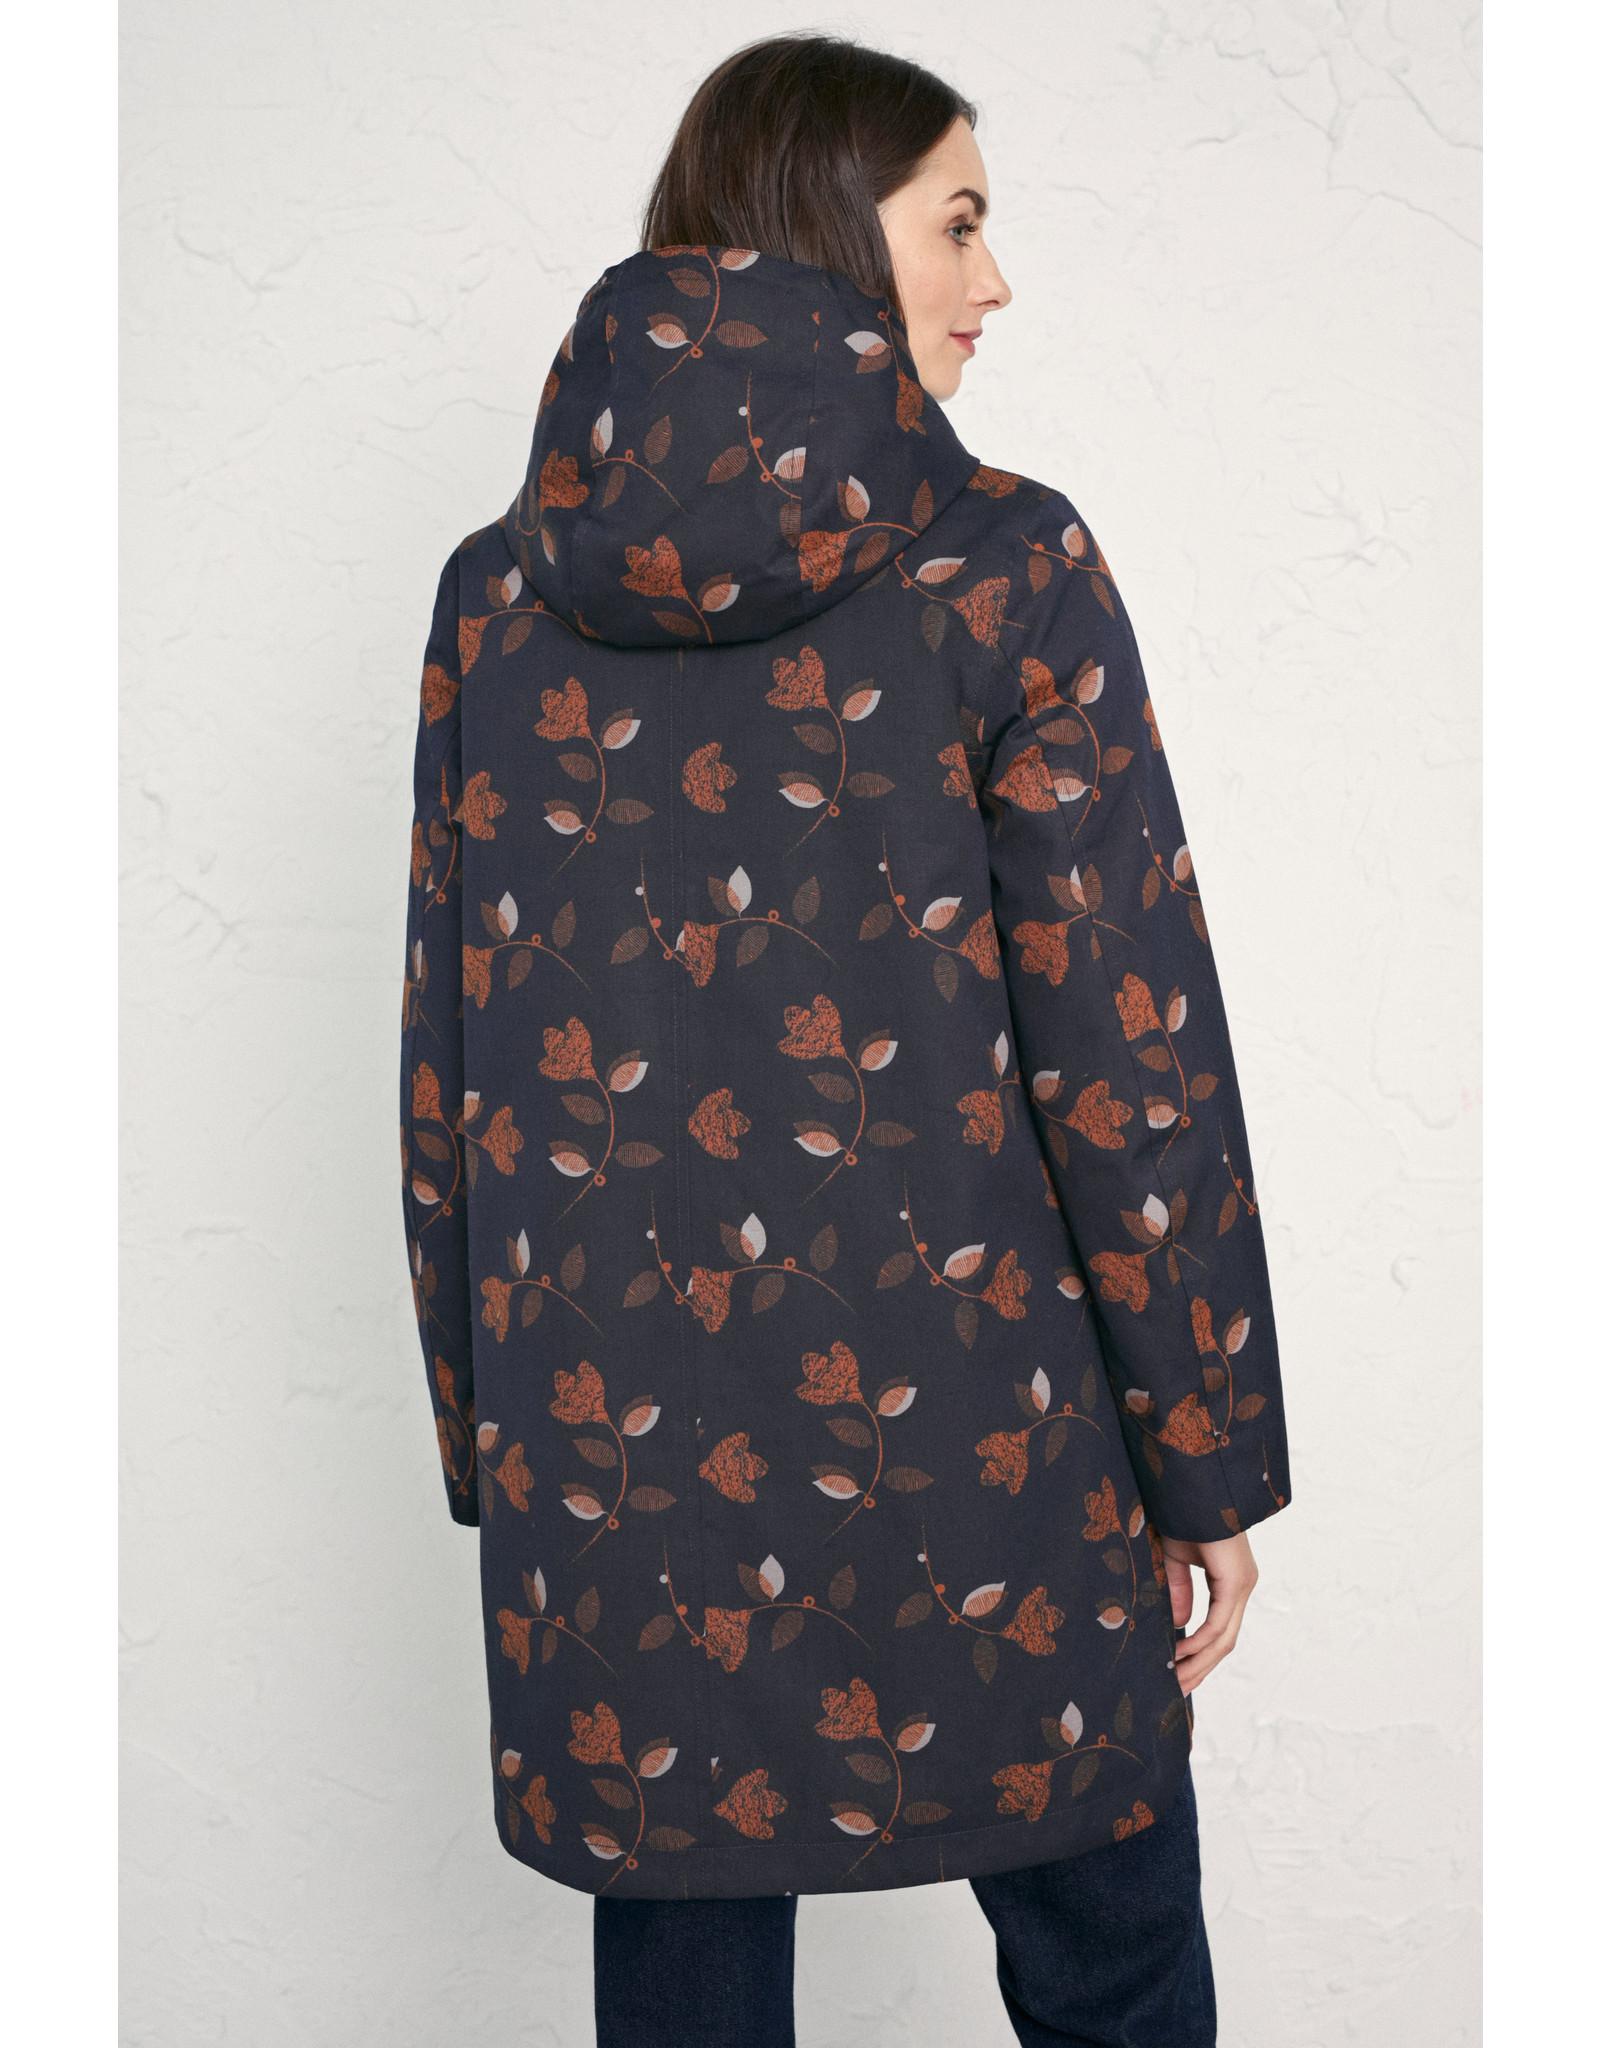 Seasalt Seasalt Saltstone Coat